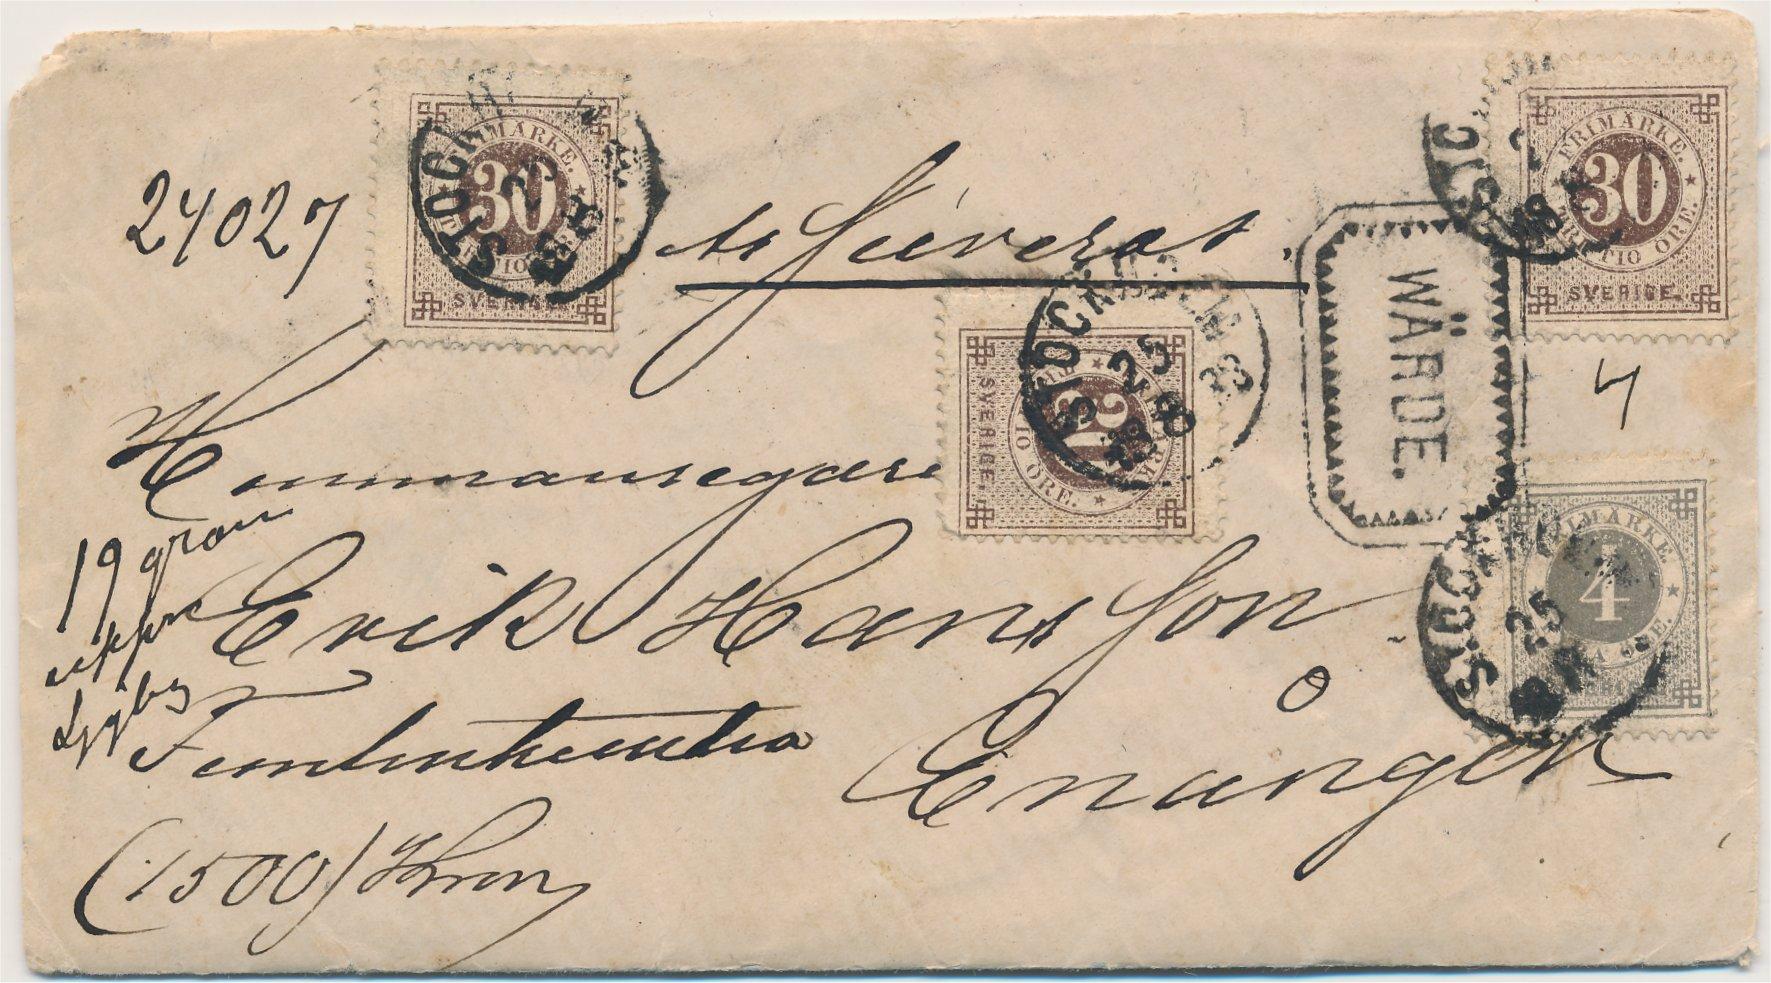 94_stockholm_25_8_1883